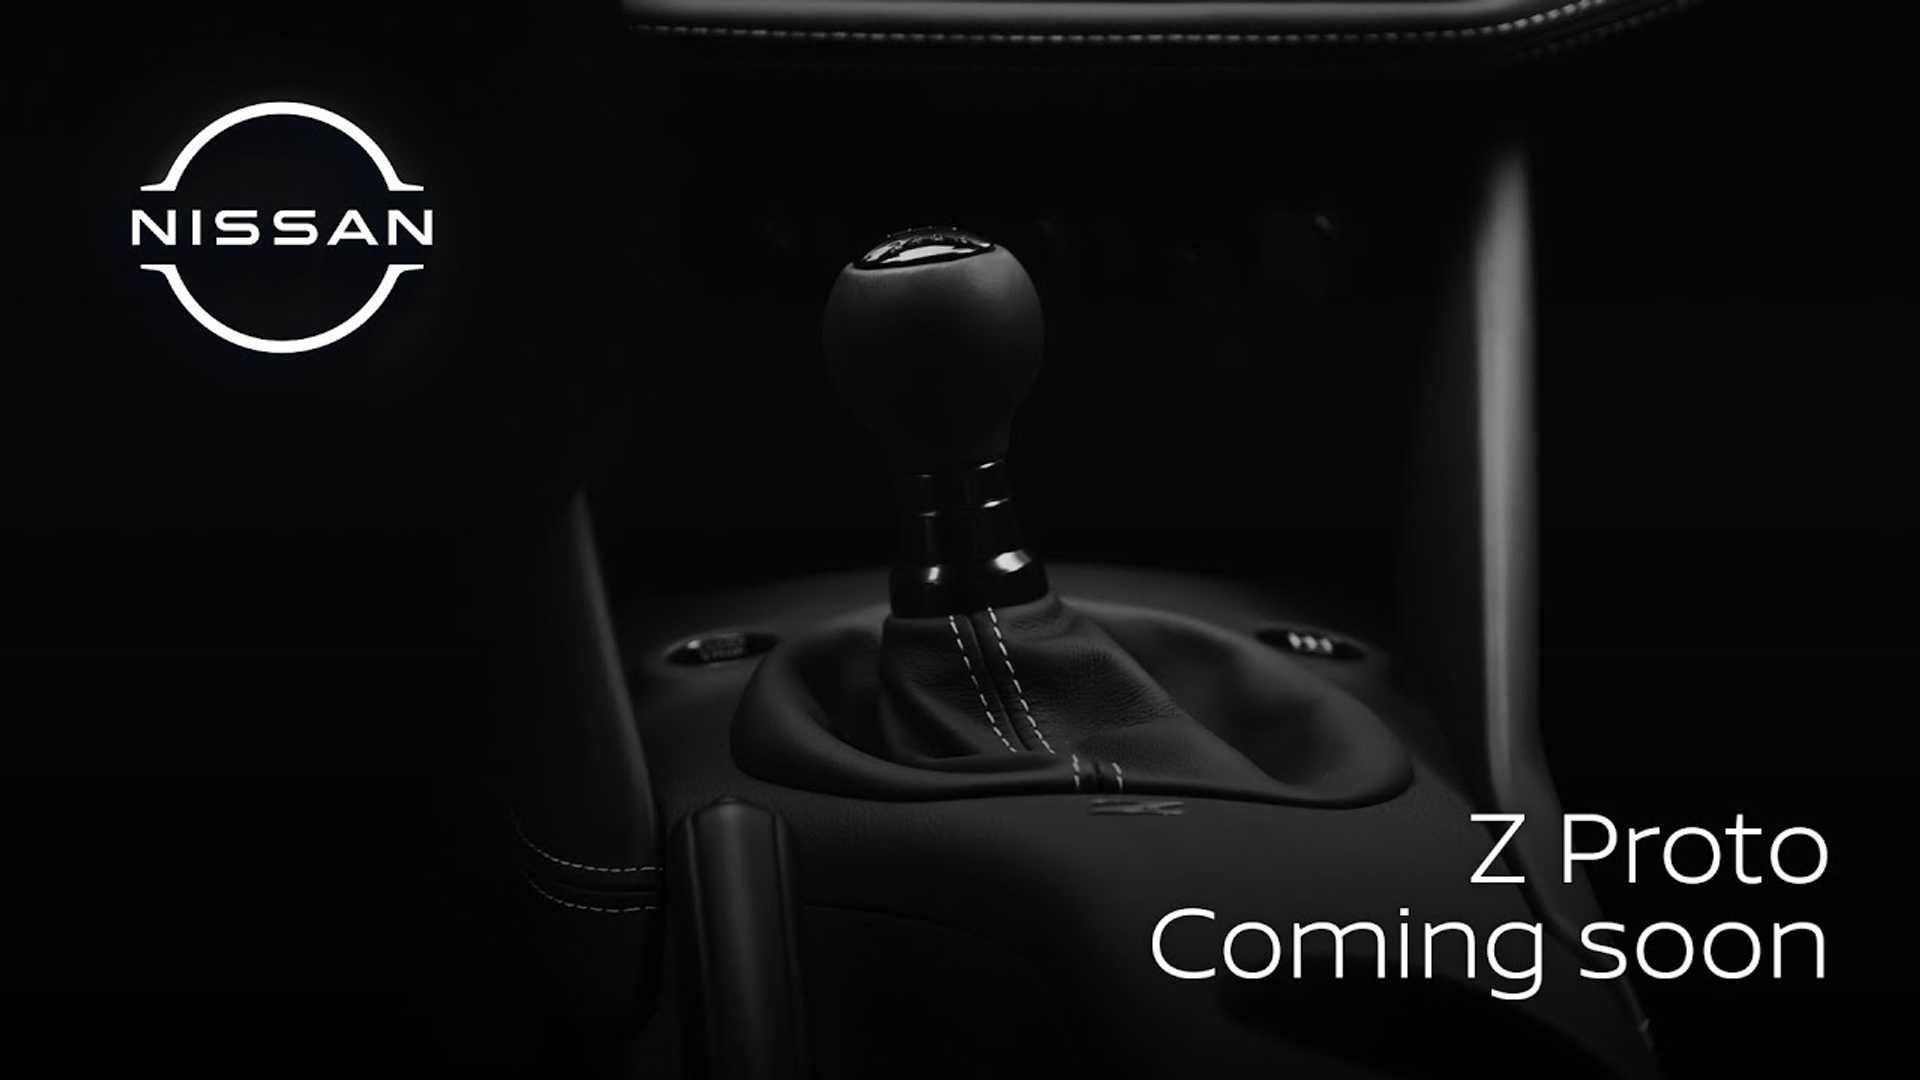 Nissan_Z_Proto_teasers_0010